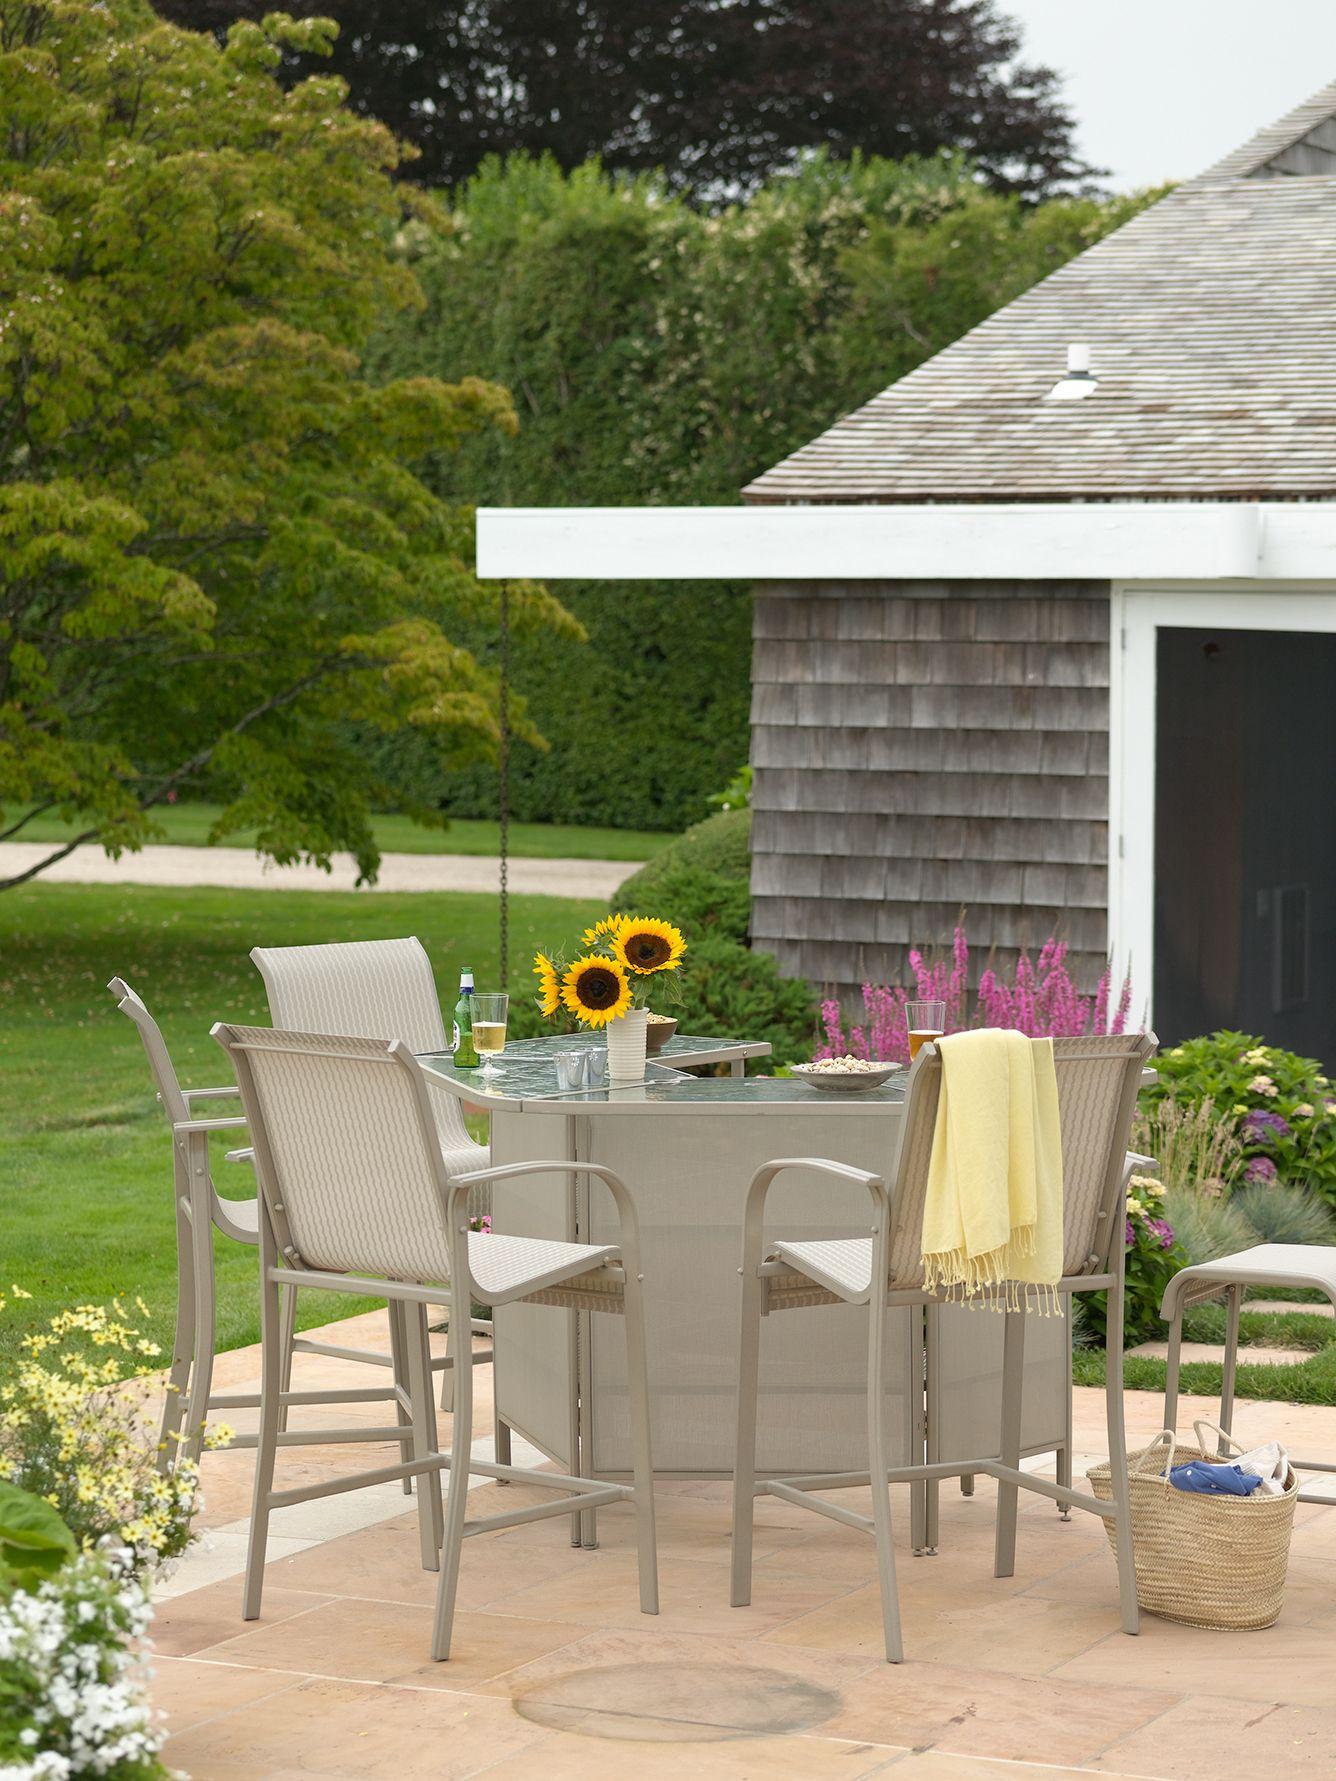 martha stewart patio chairs pallet wood chair instructions everyday garden melrose bar outdoor